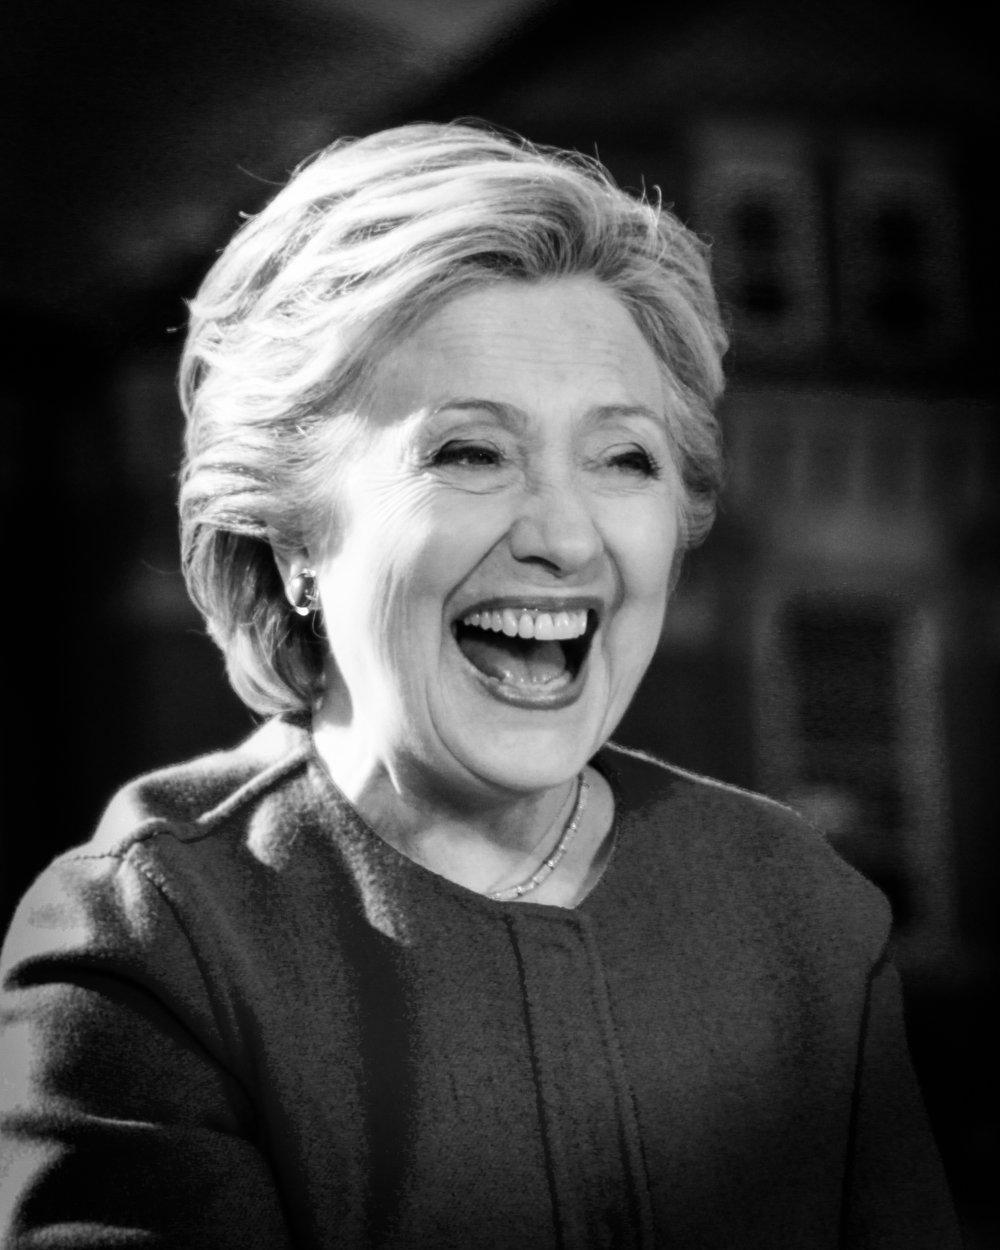 Hillary Clinton Portrait 10